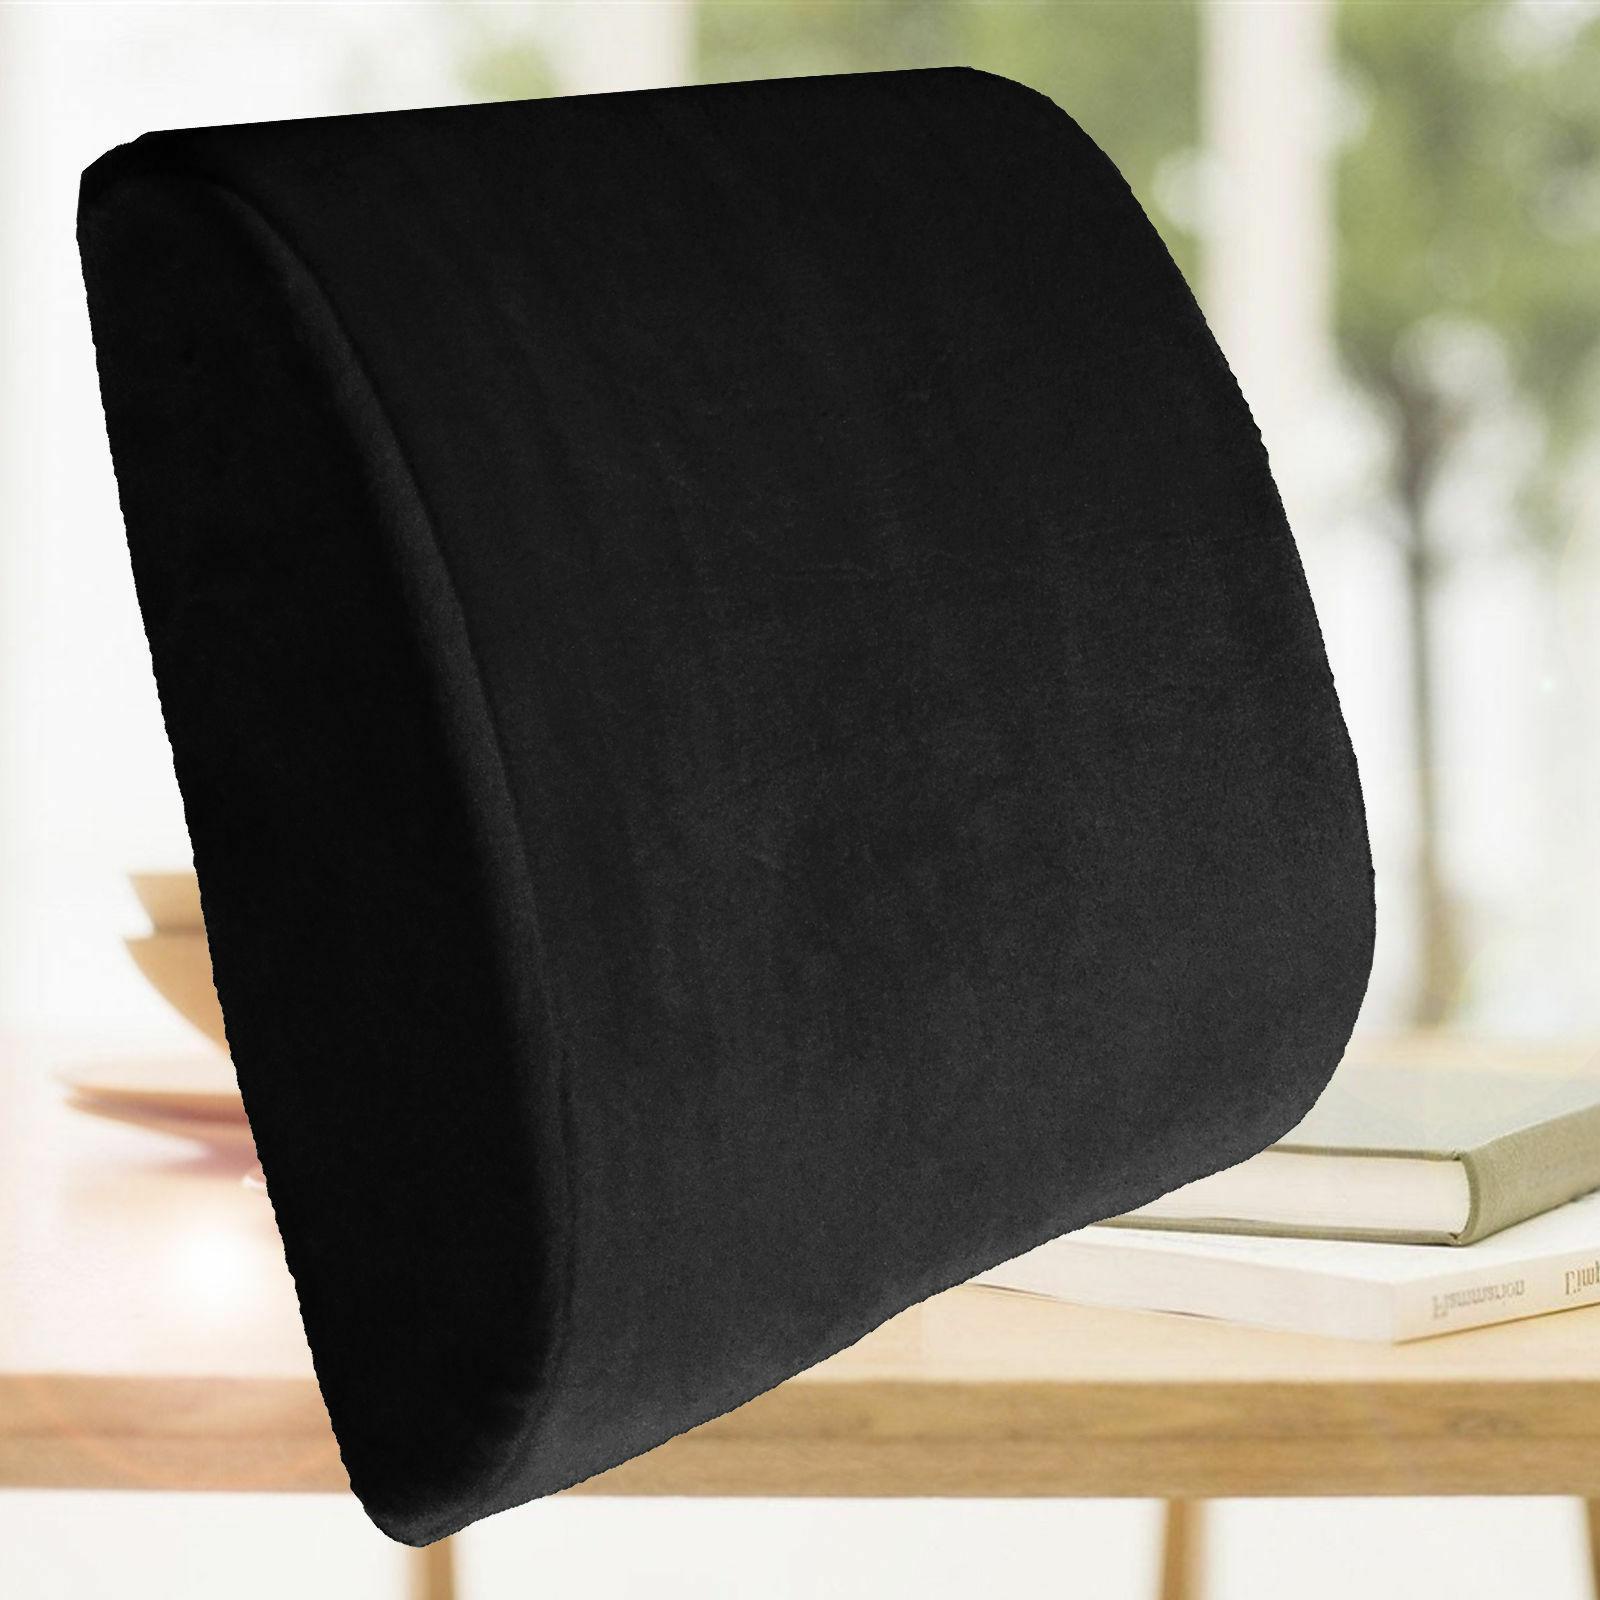 Orthopedic Memory Coccyx Seat Back Support Lumbar Set